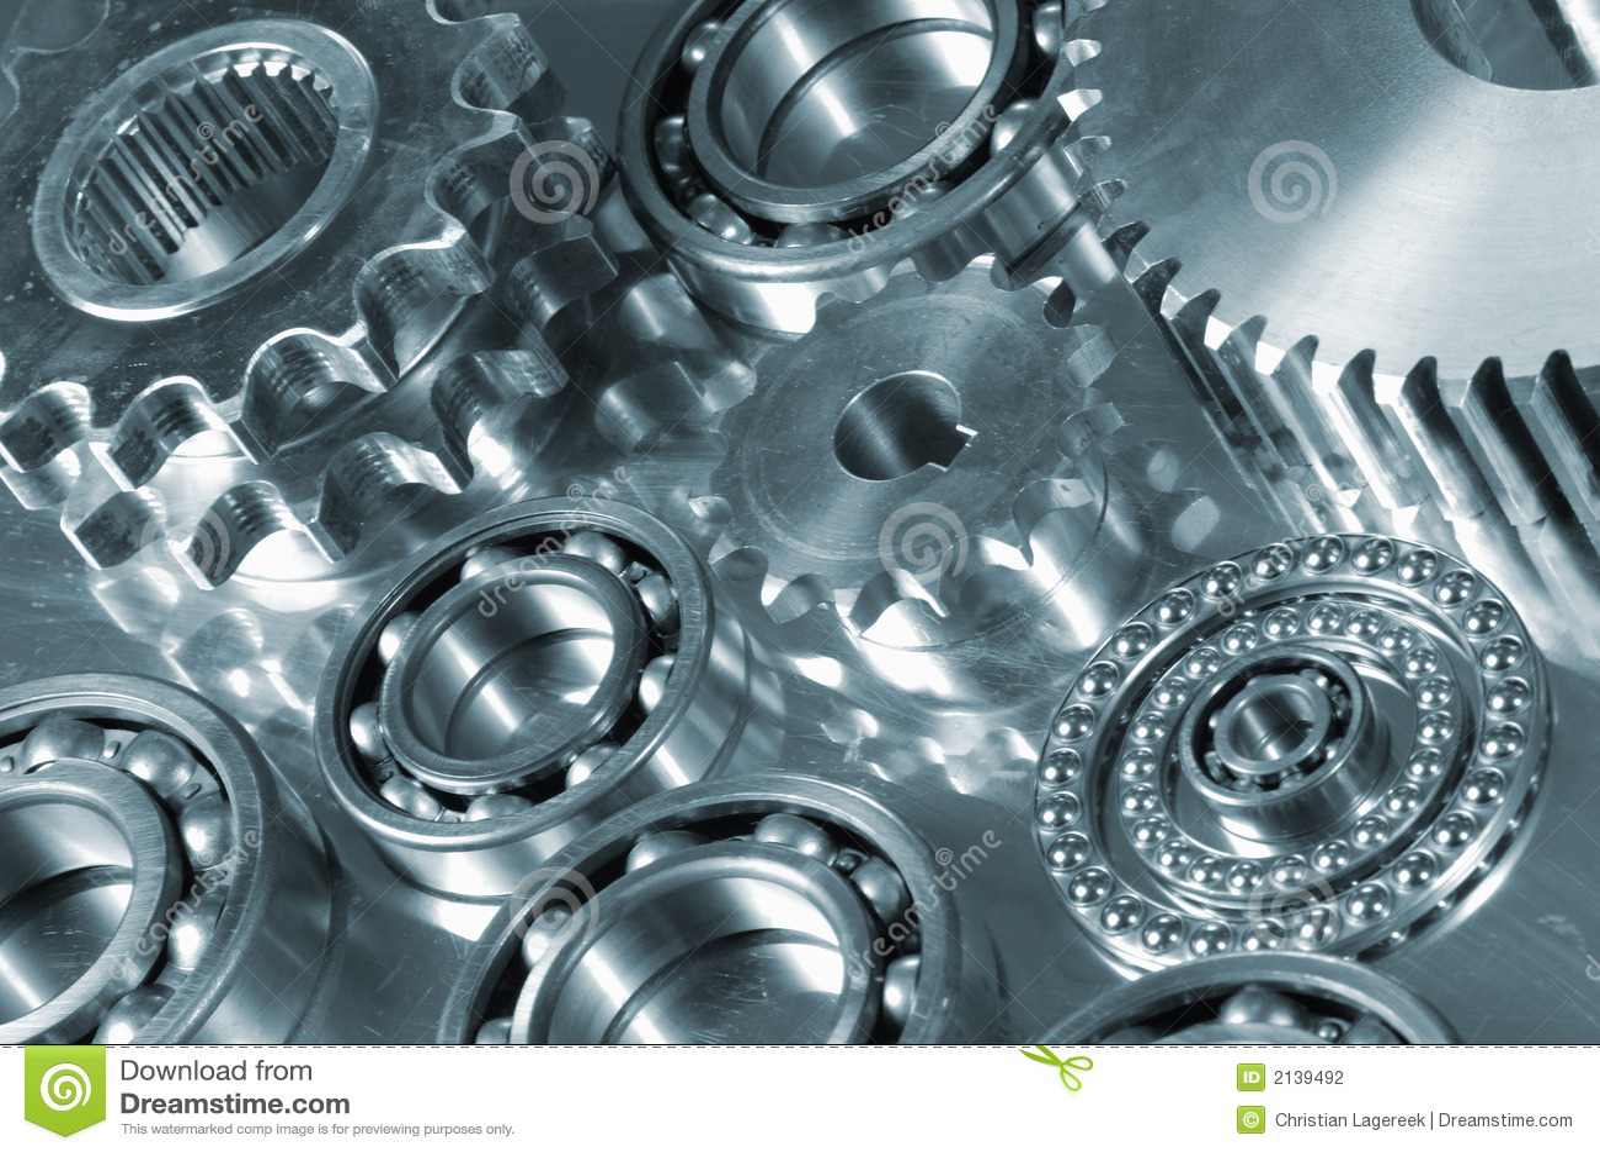 Gears and bearings on display